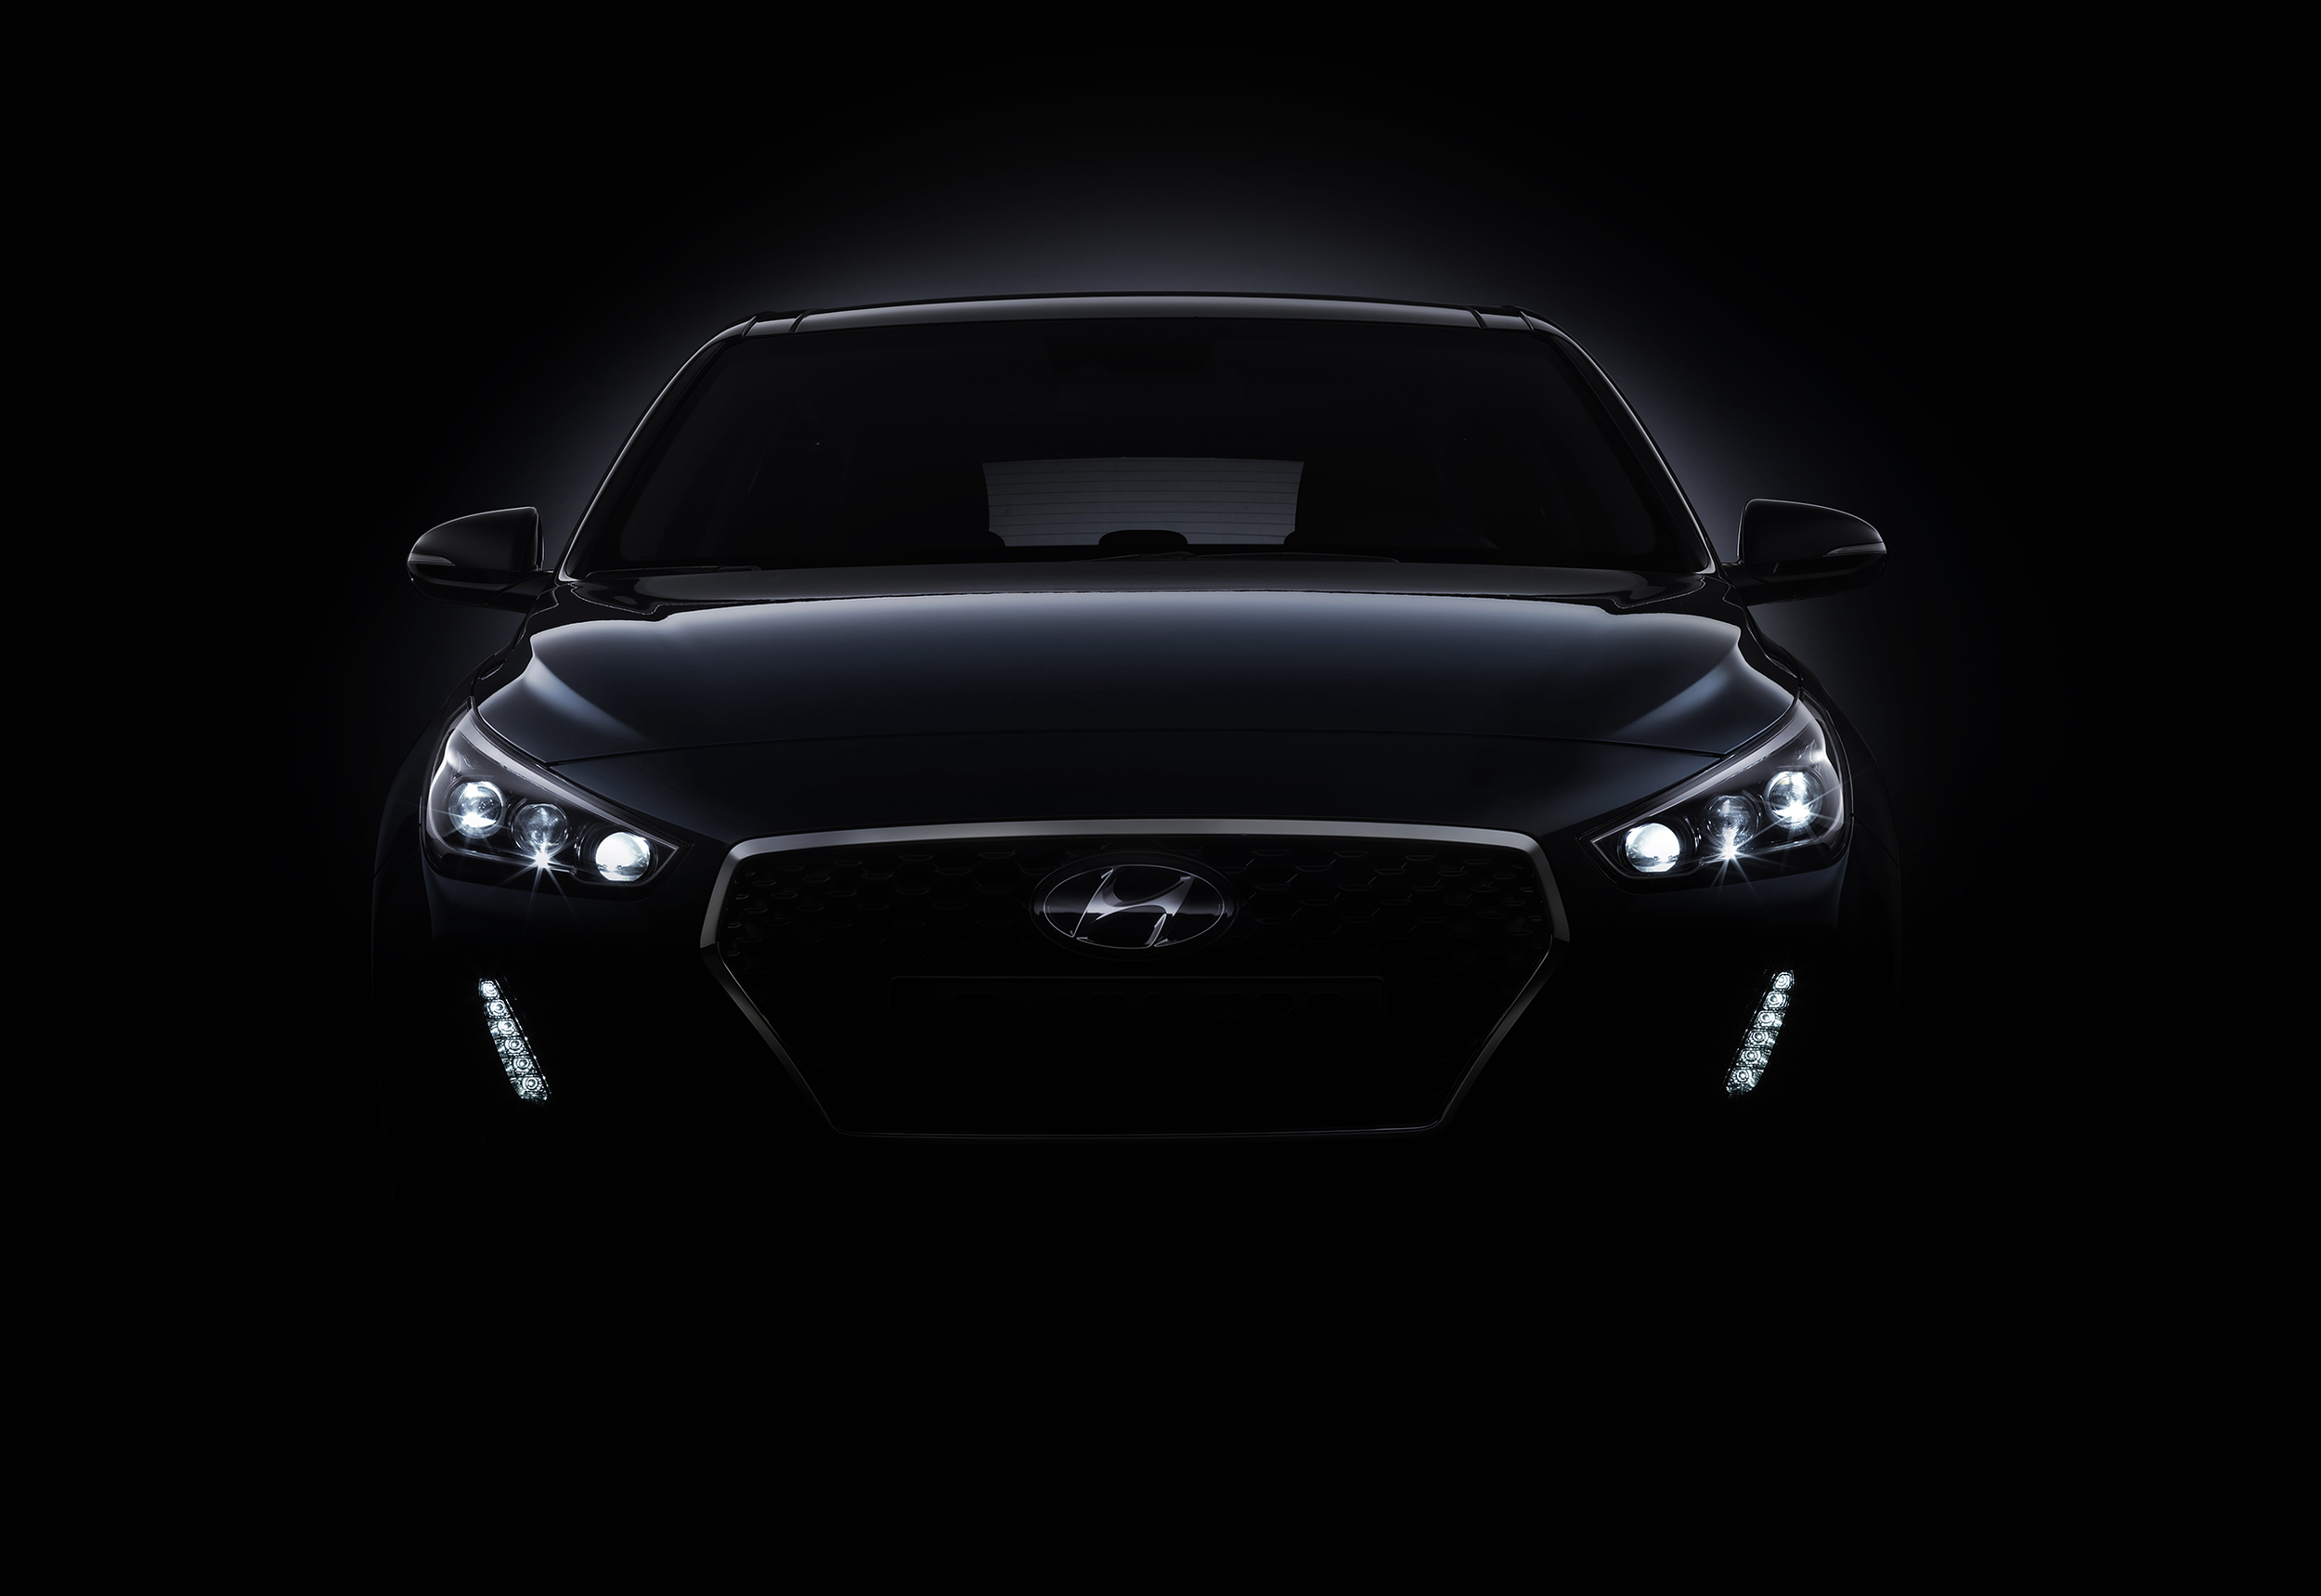 new_generation_hyundai_i30_teaser_front.jpg